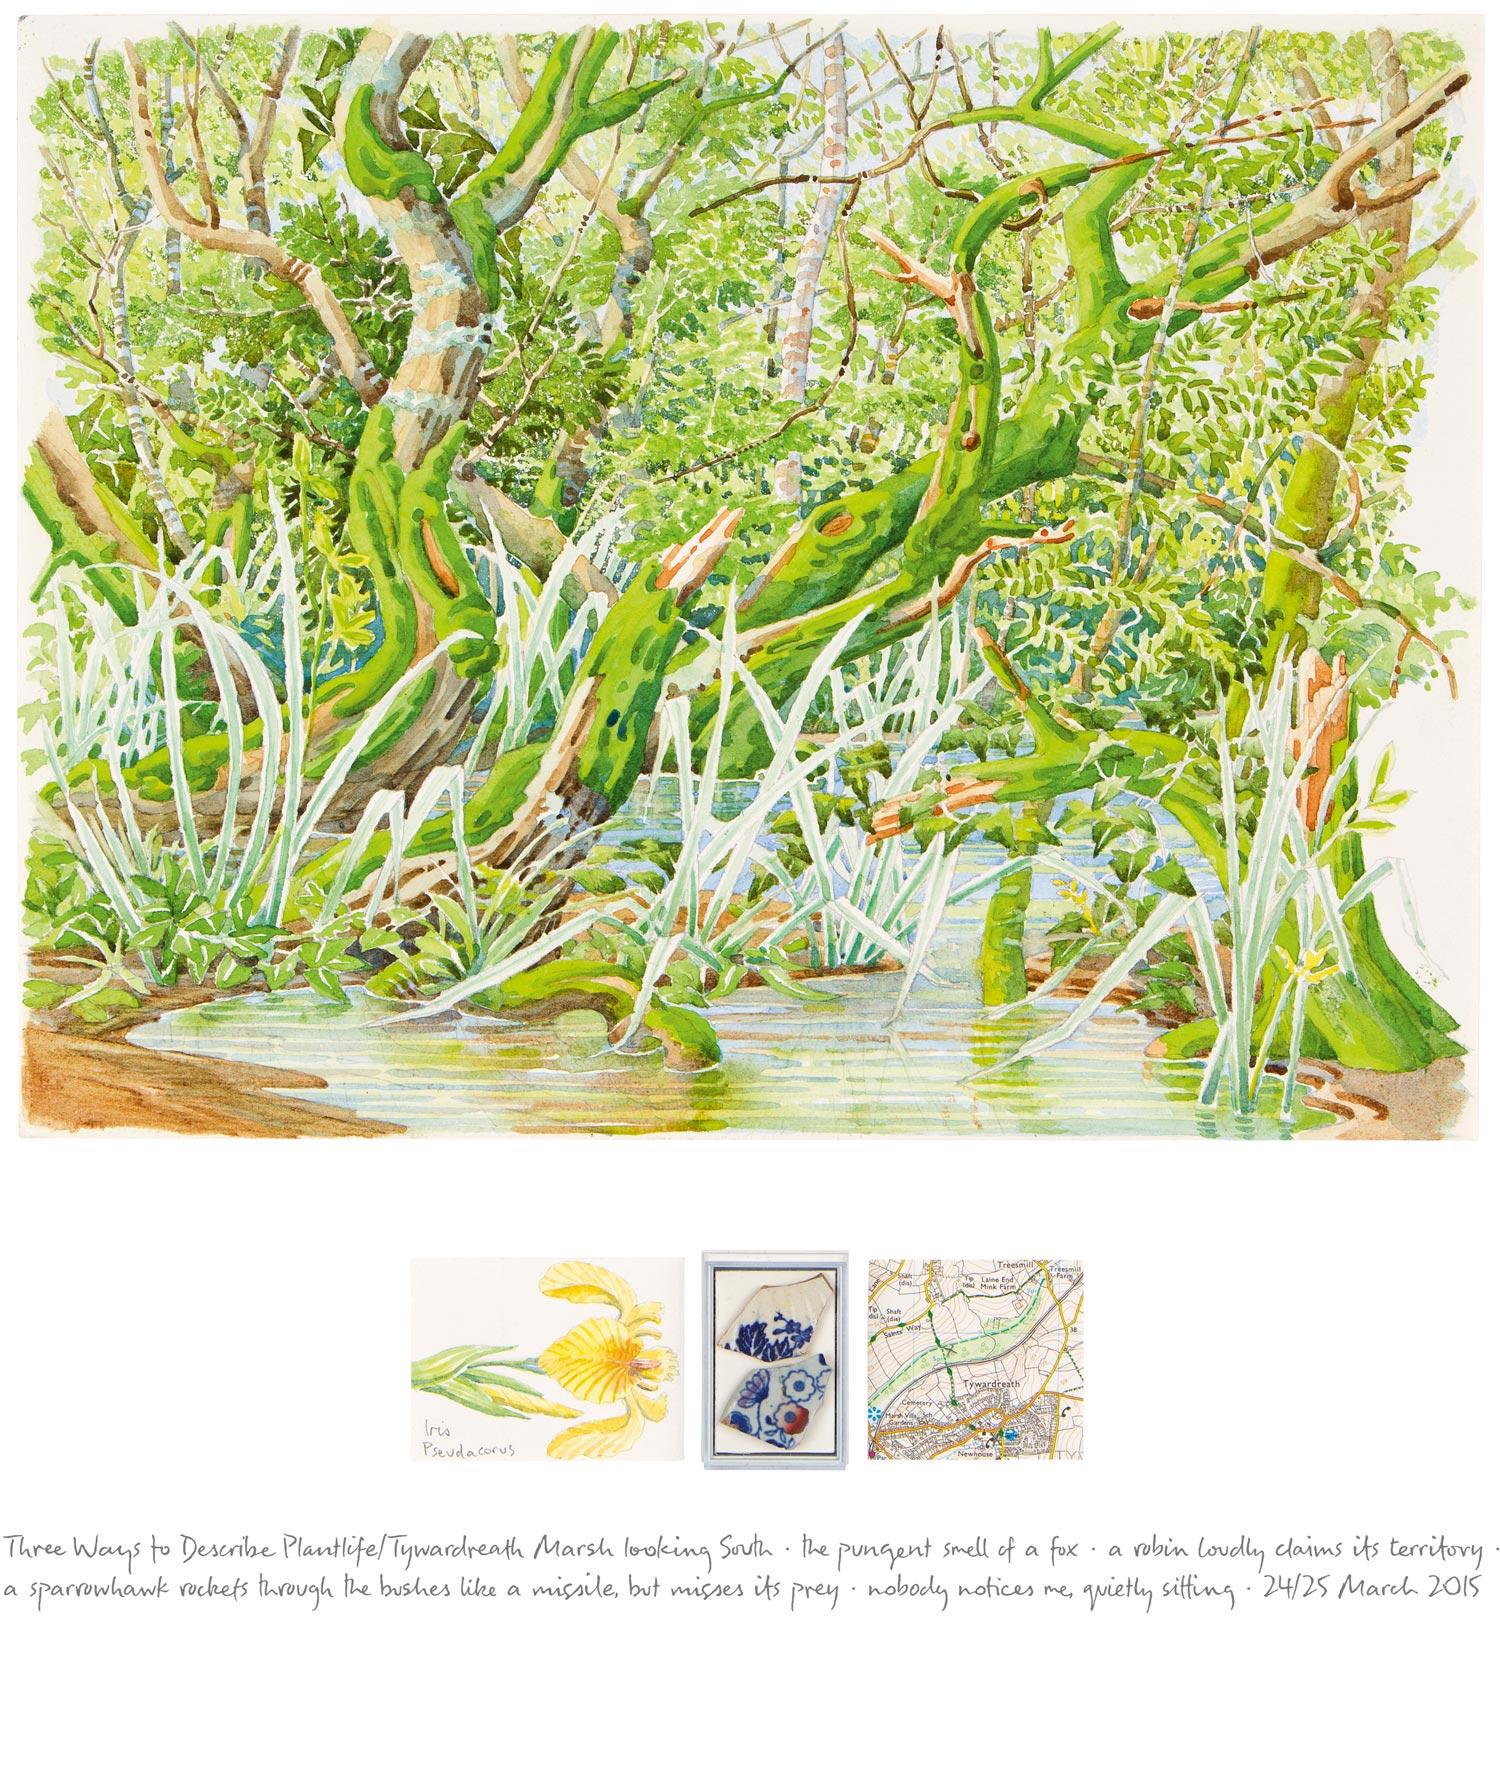 Tony Foster ,  Three Ways to Describe Plantlife / Three Wildlife Observations—Tywardreath Marsh Looking South , 2015